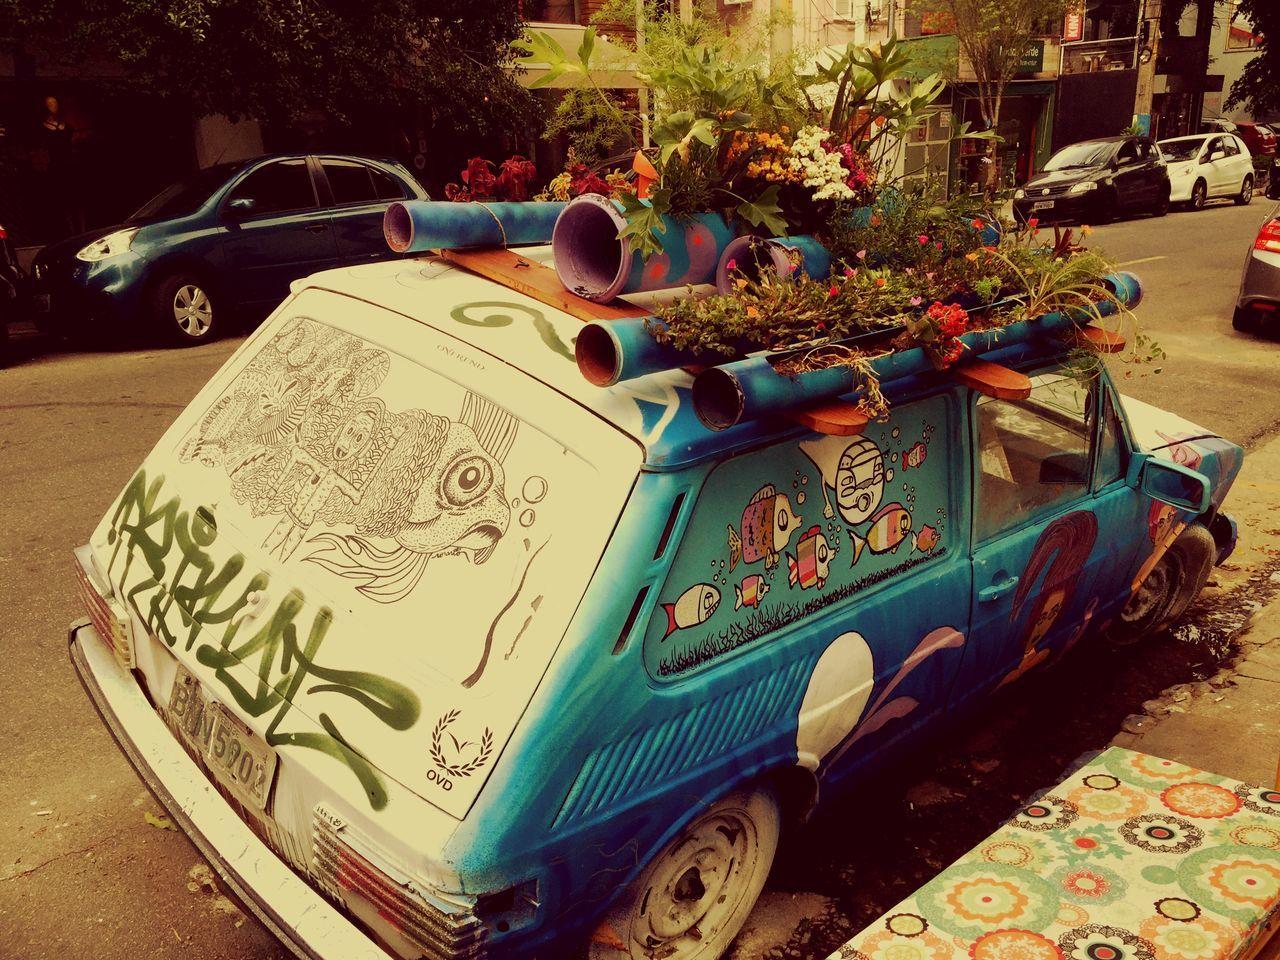 Vila Madalena São Paulo, Brasil Say Hello The Best Car Ever Walking Around Taking Photos Neighborhood It's Friday Tree Car